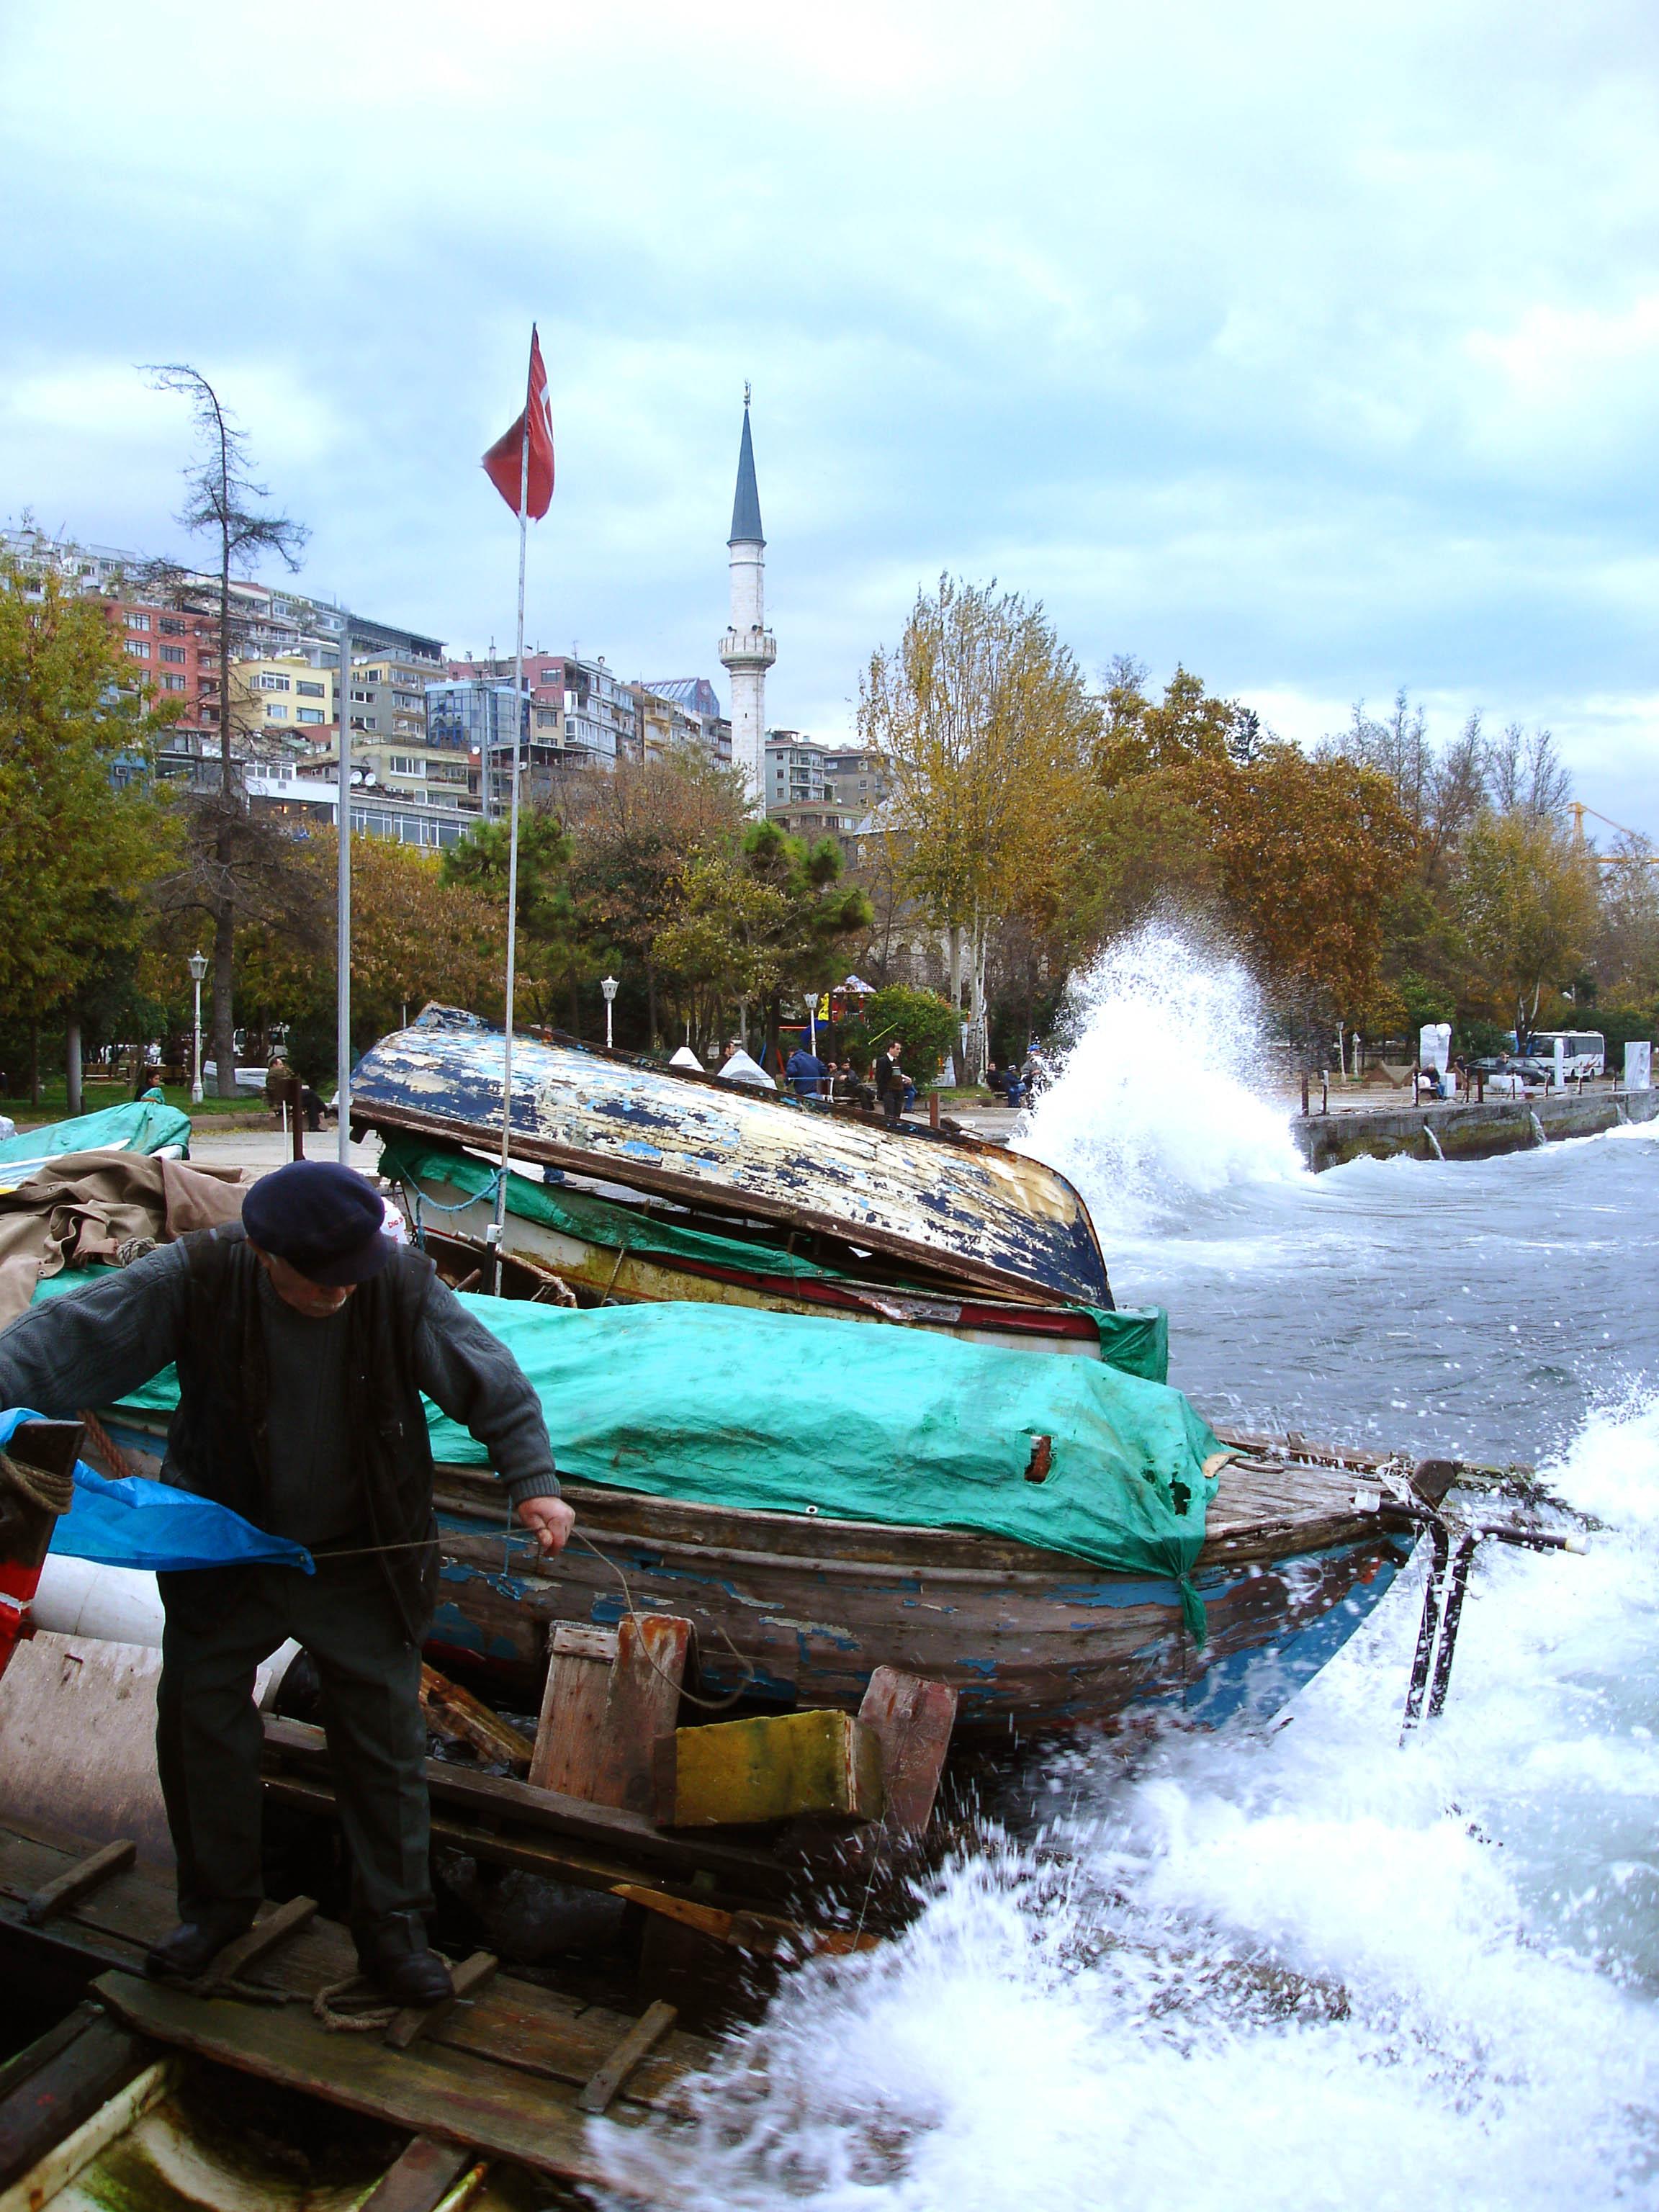 boat in storm - tuonela